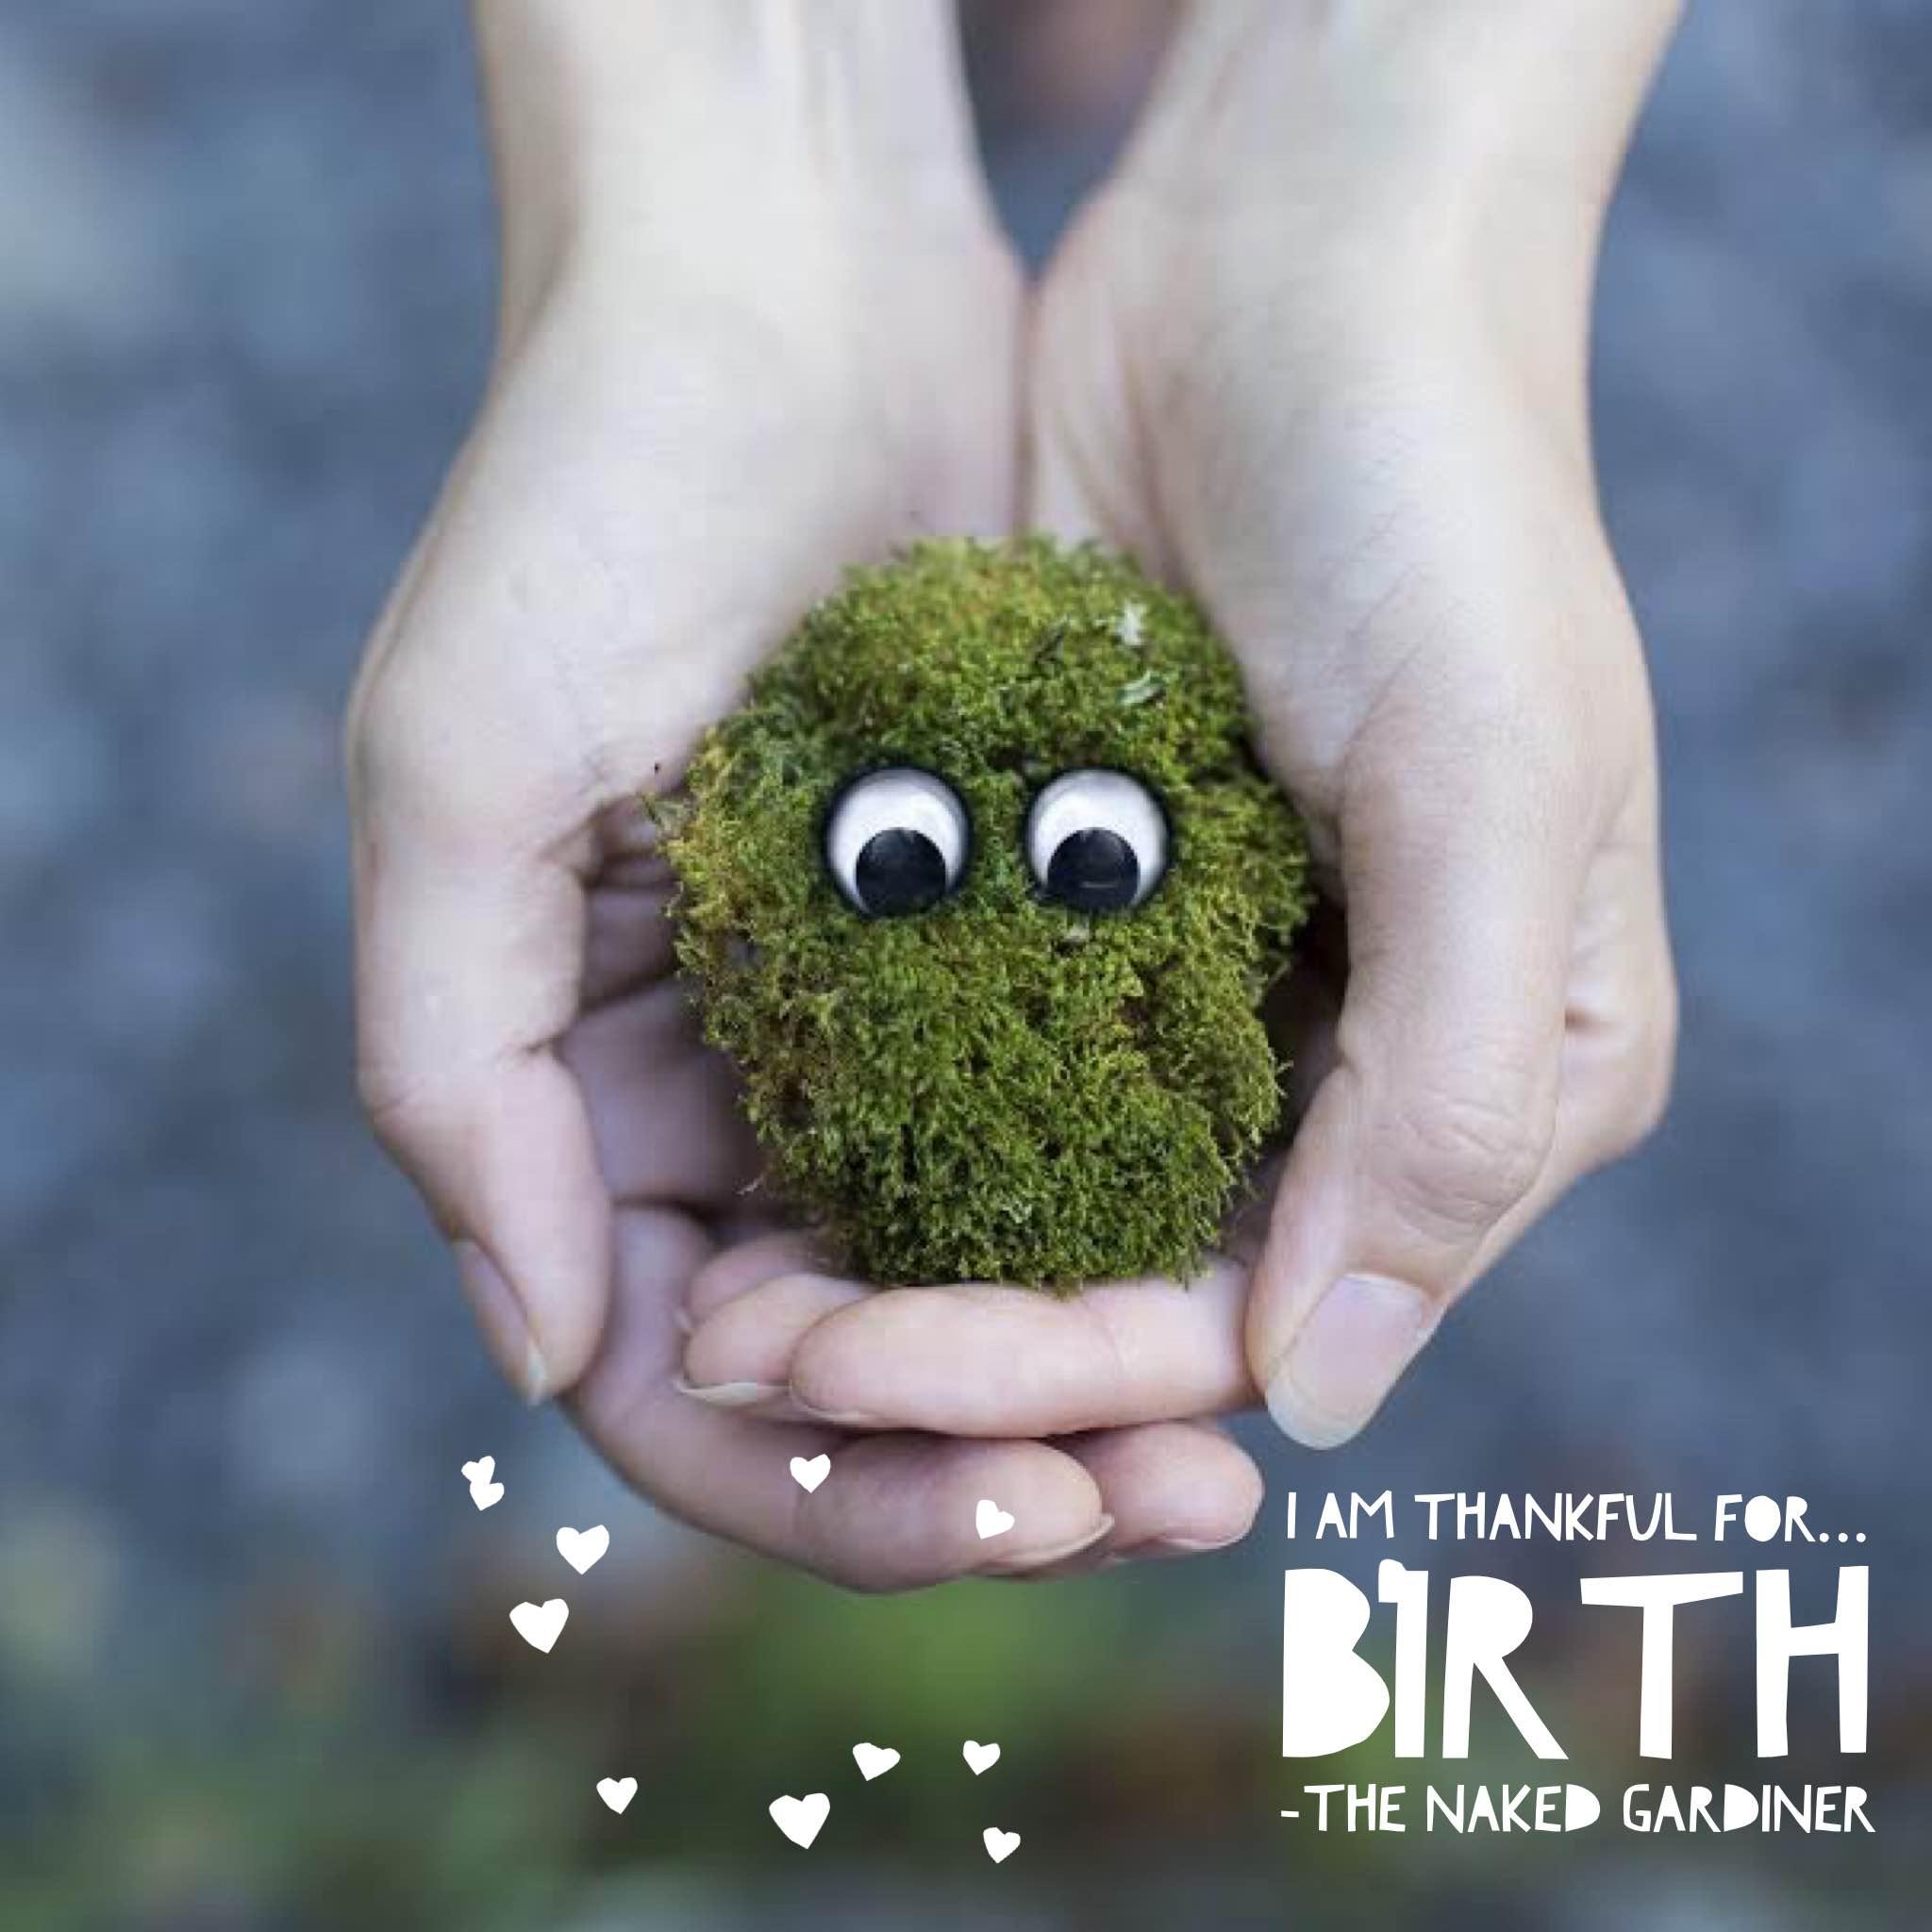 thankful-thursdays-birth-thenakedgardiner-ryanmcguire